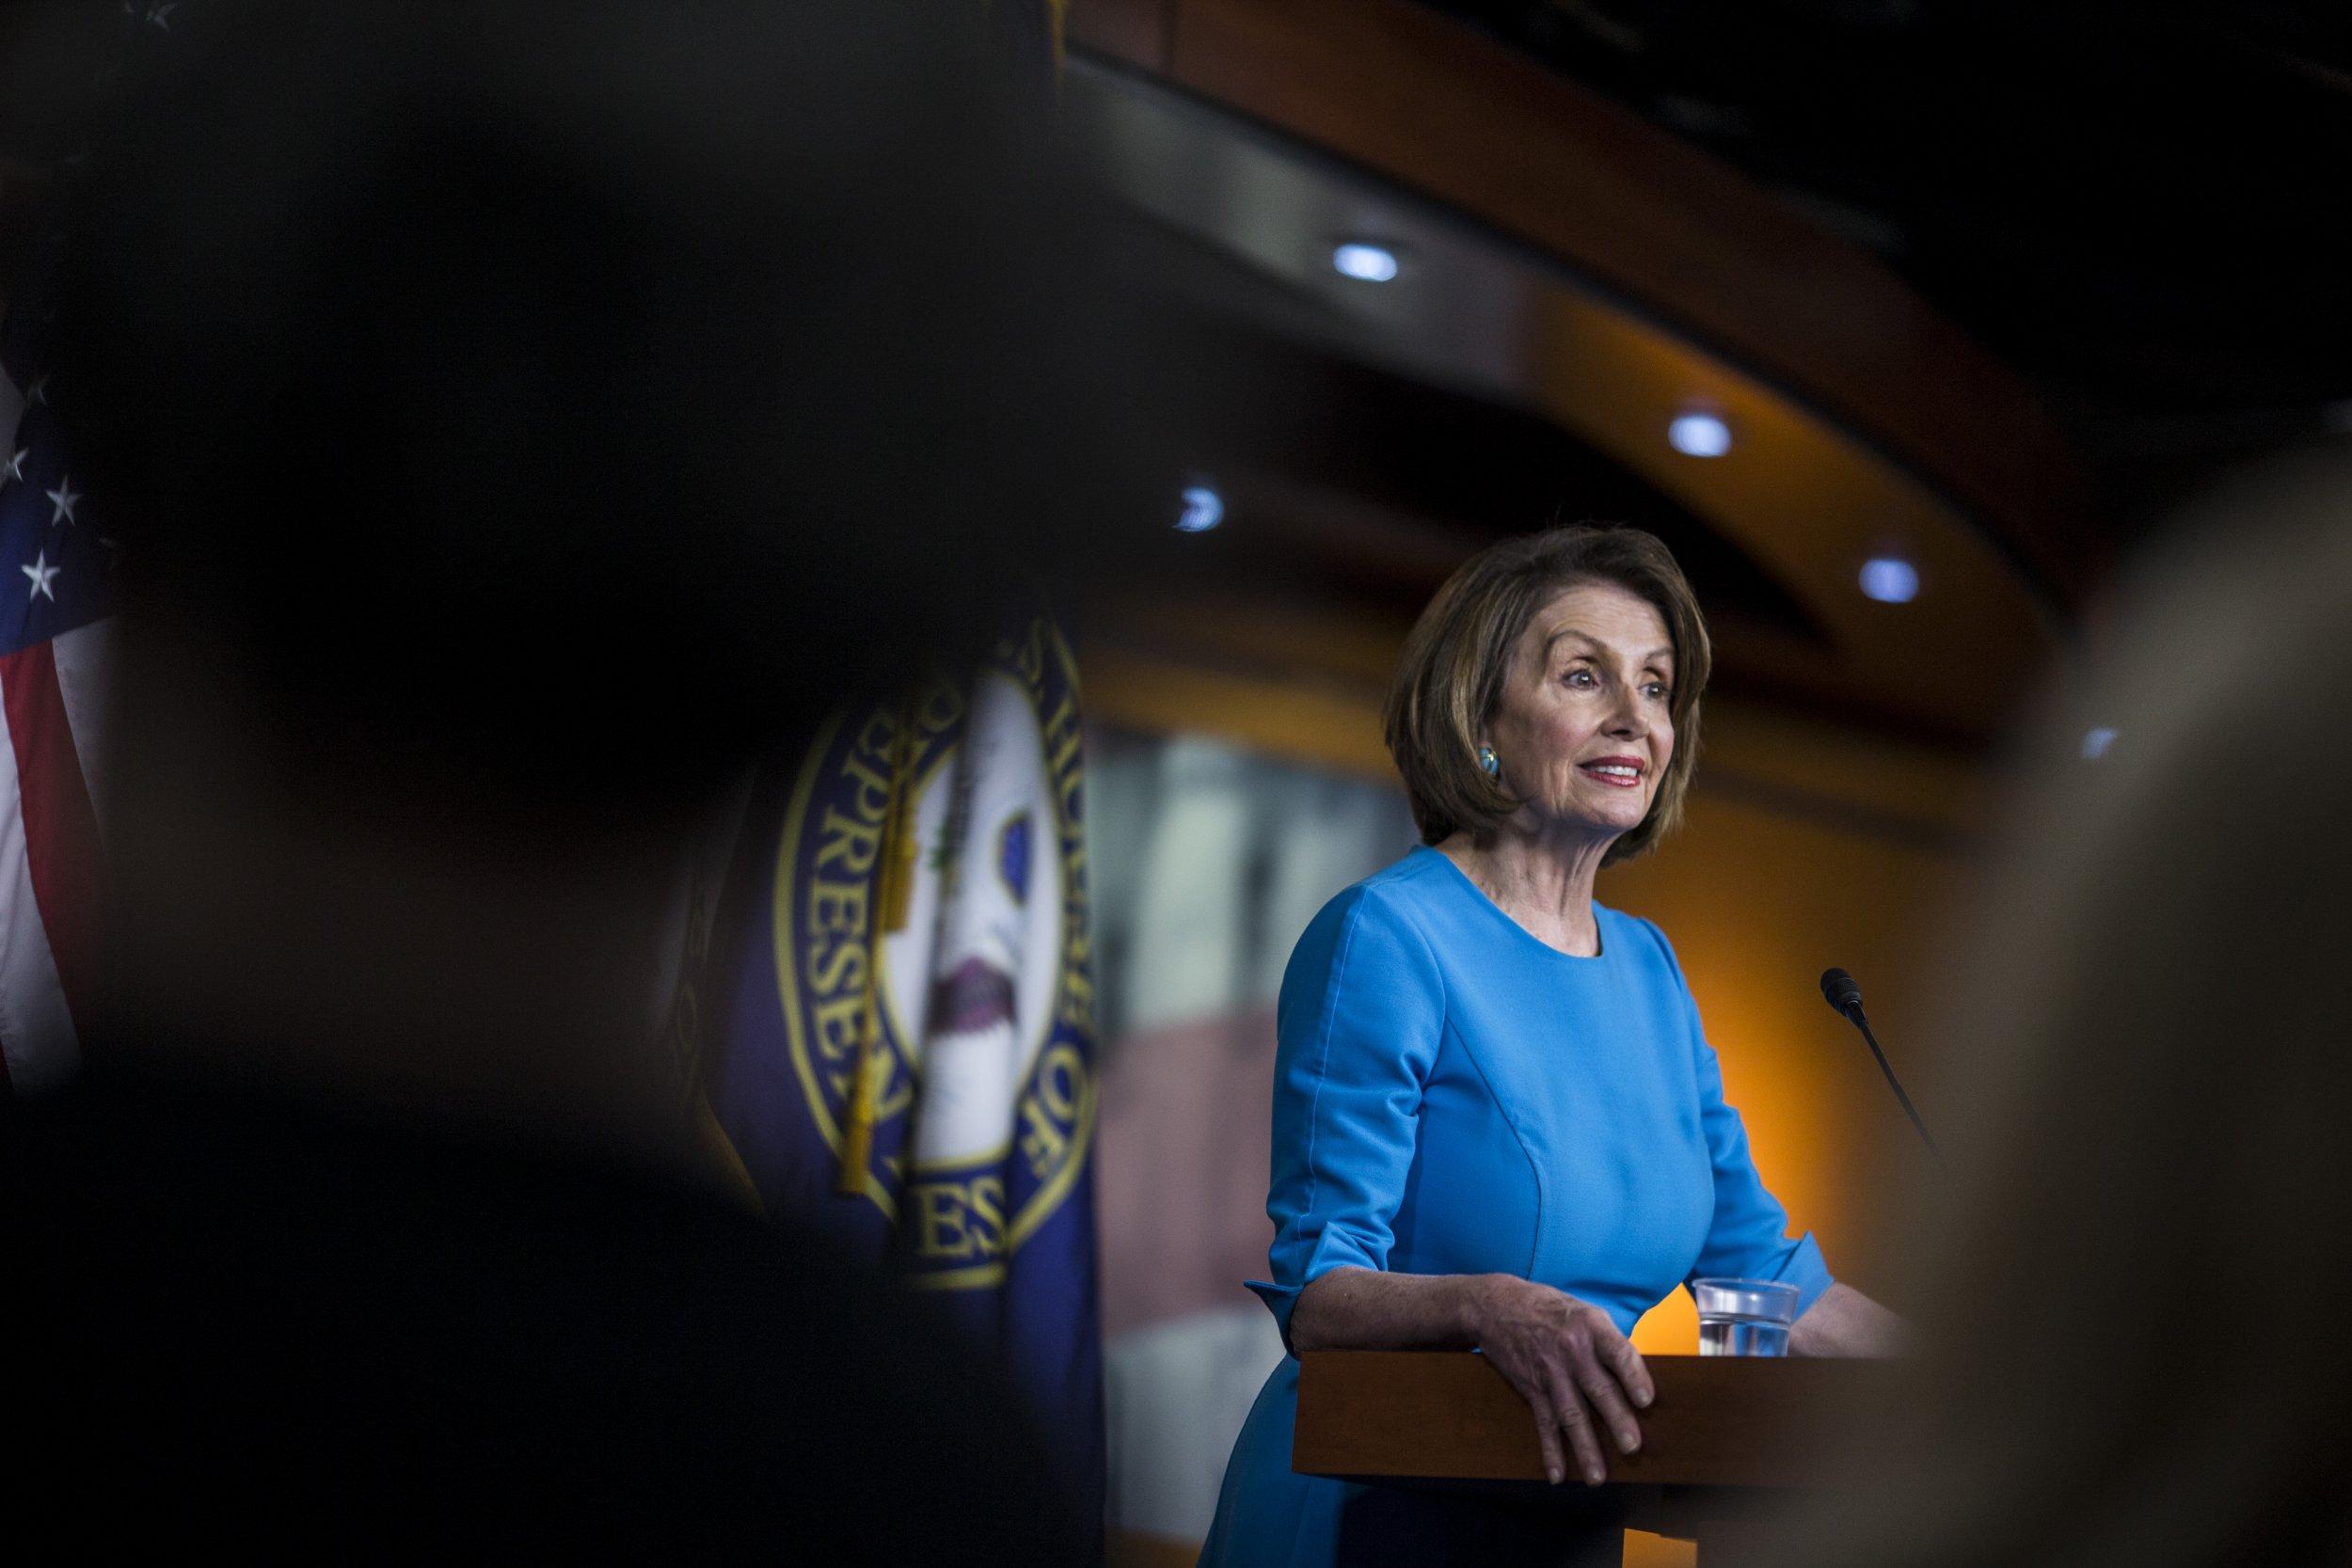 Pelosi Says She Will 'Pray' For Trump After Surprise Presser Blasting Democrats